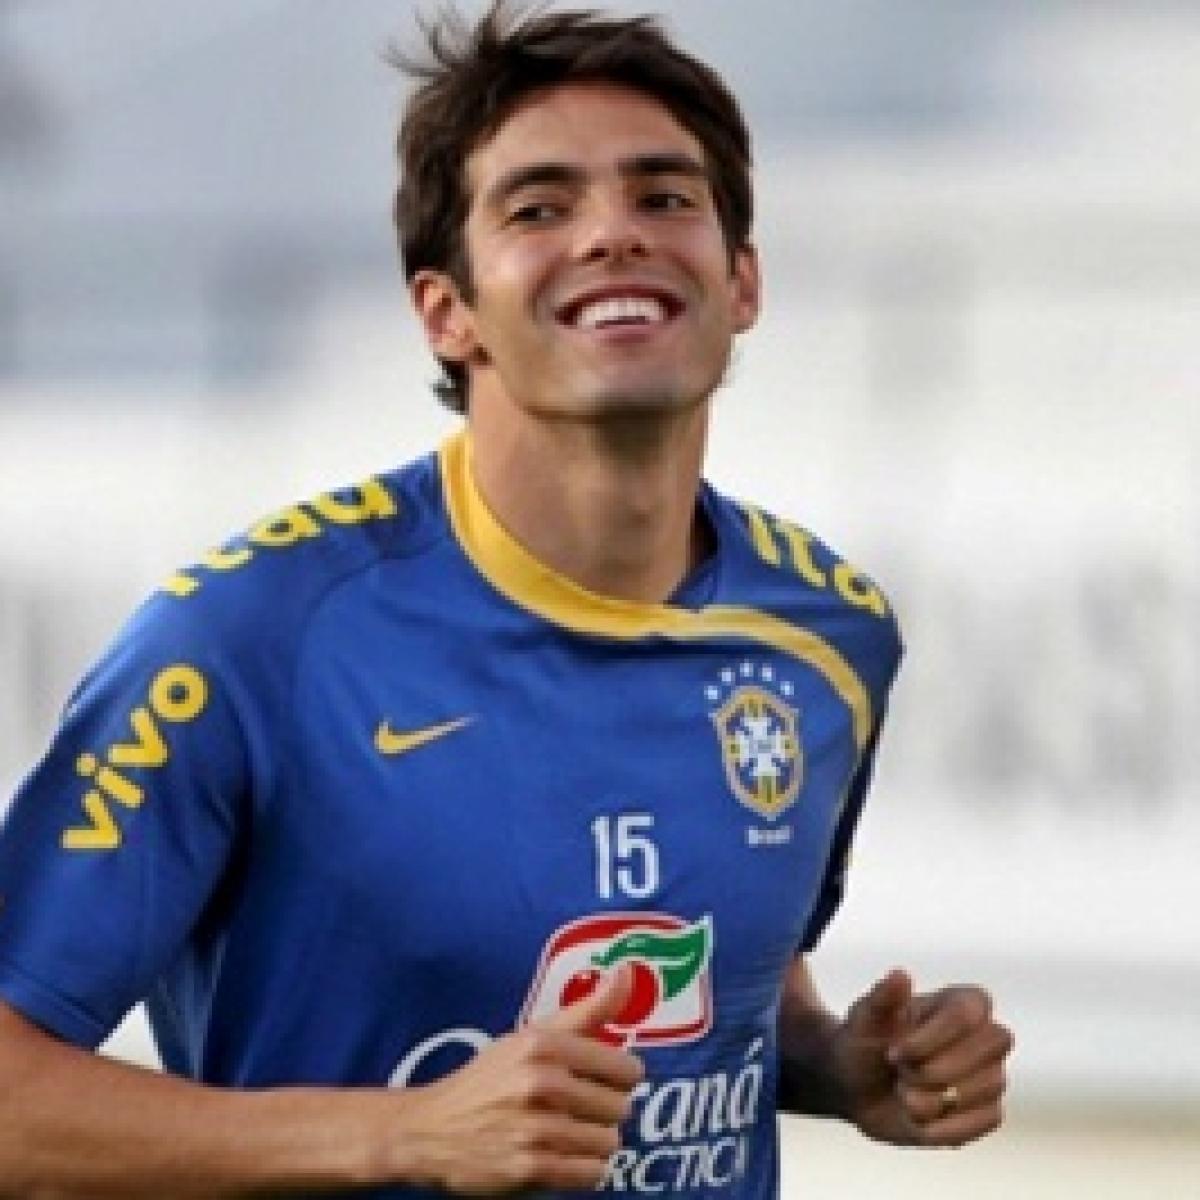 Lionel Messi or Cristiano Ronaldo? Brazilian legend Kaka has chosen his G.O.A.T